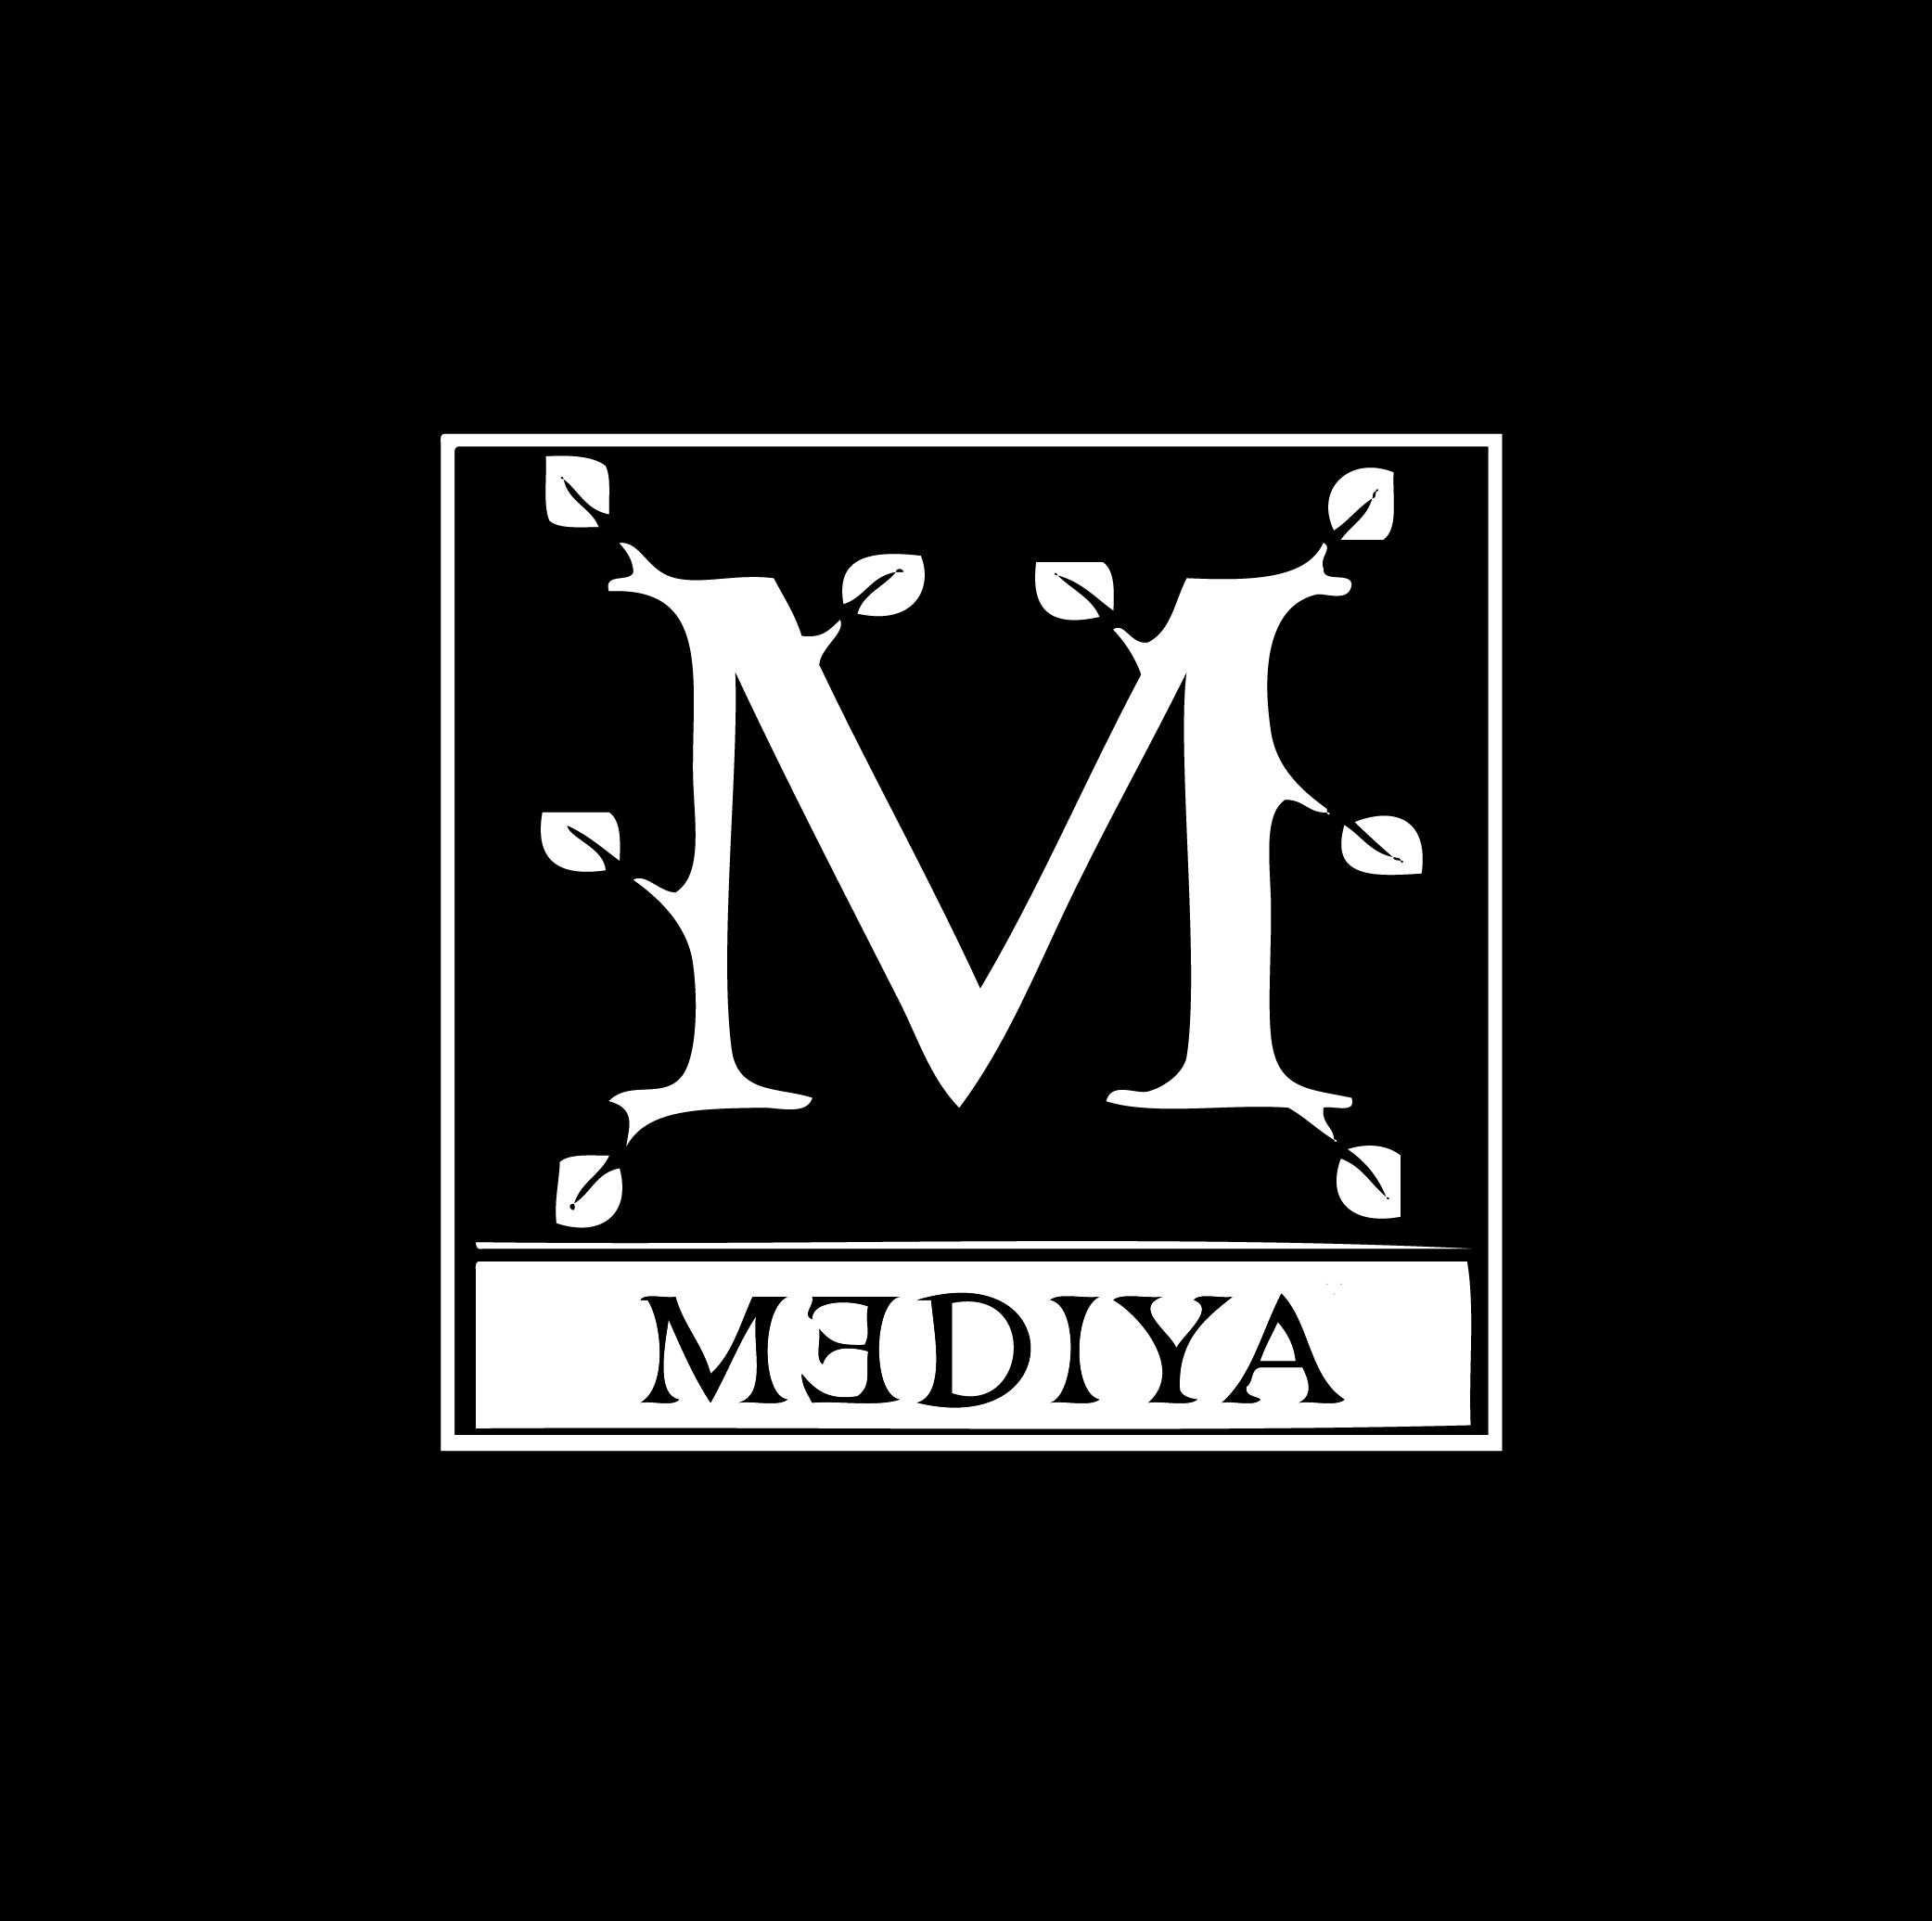 social_MEDIYA